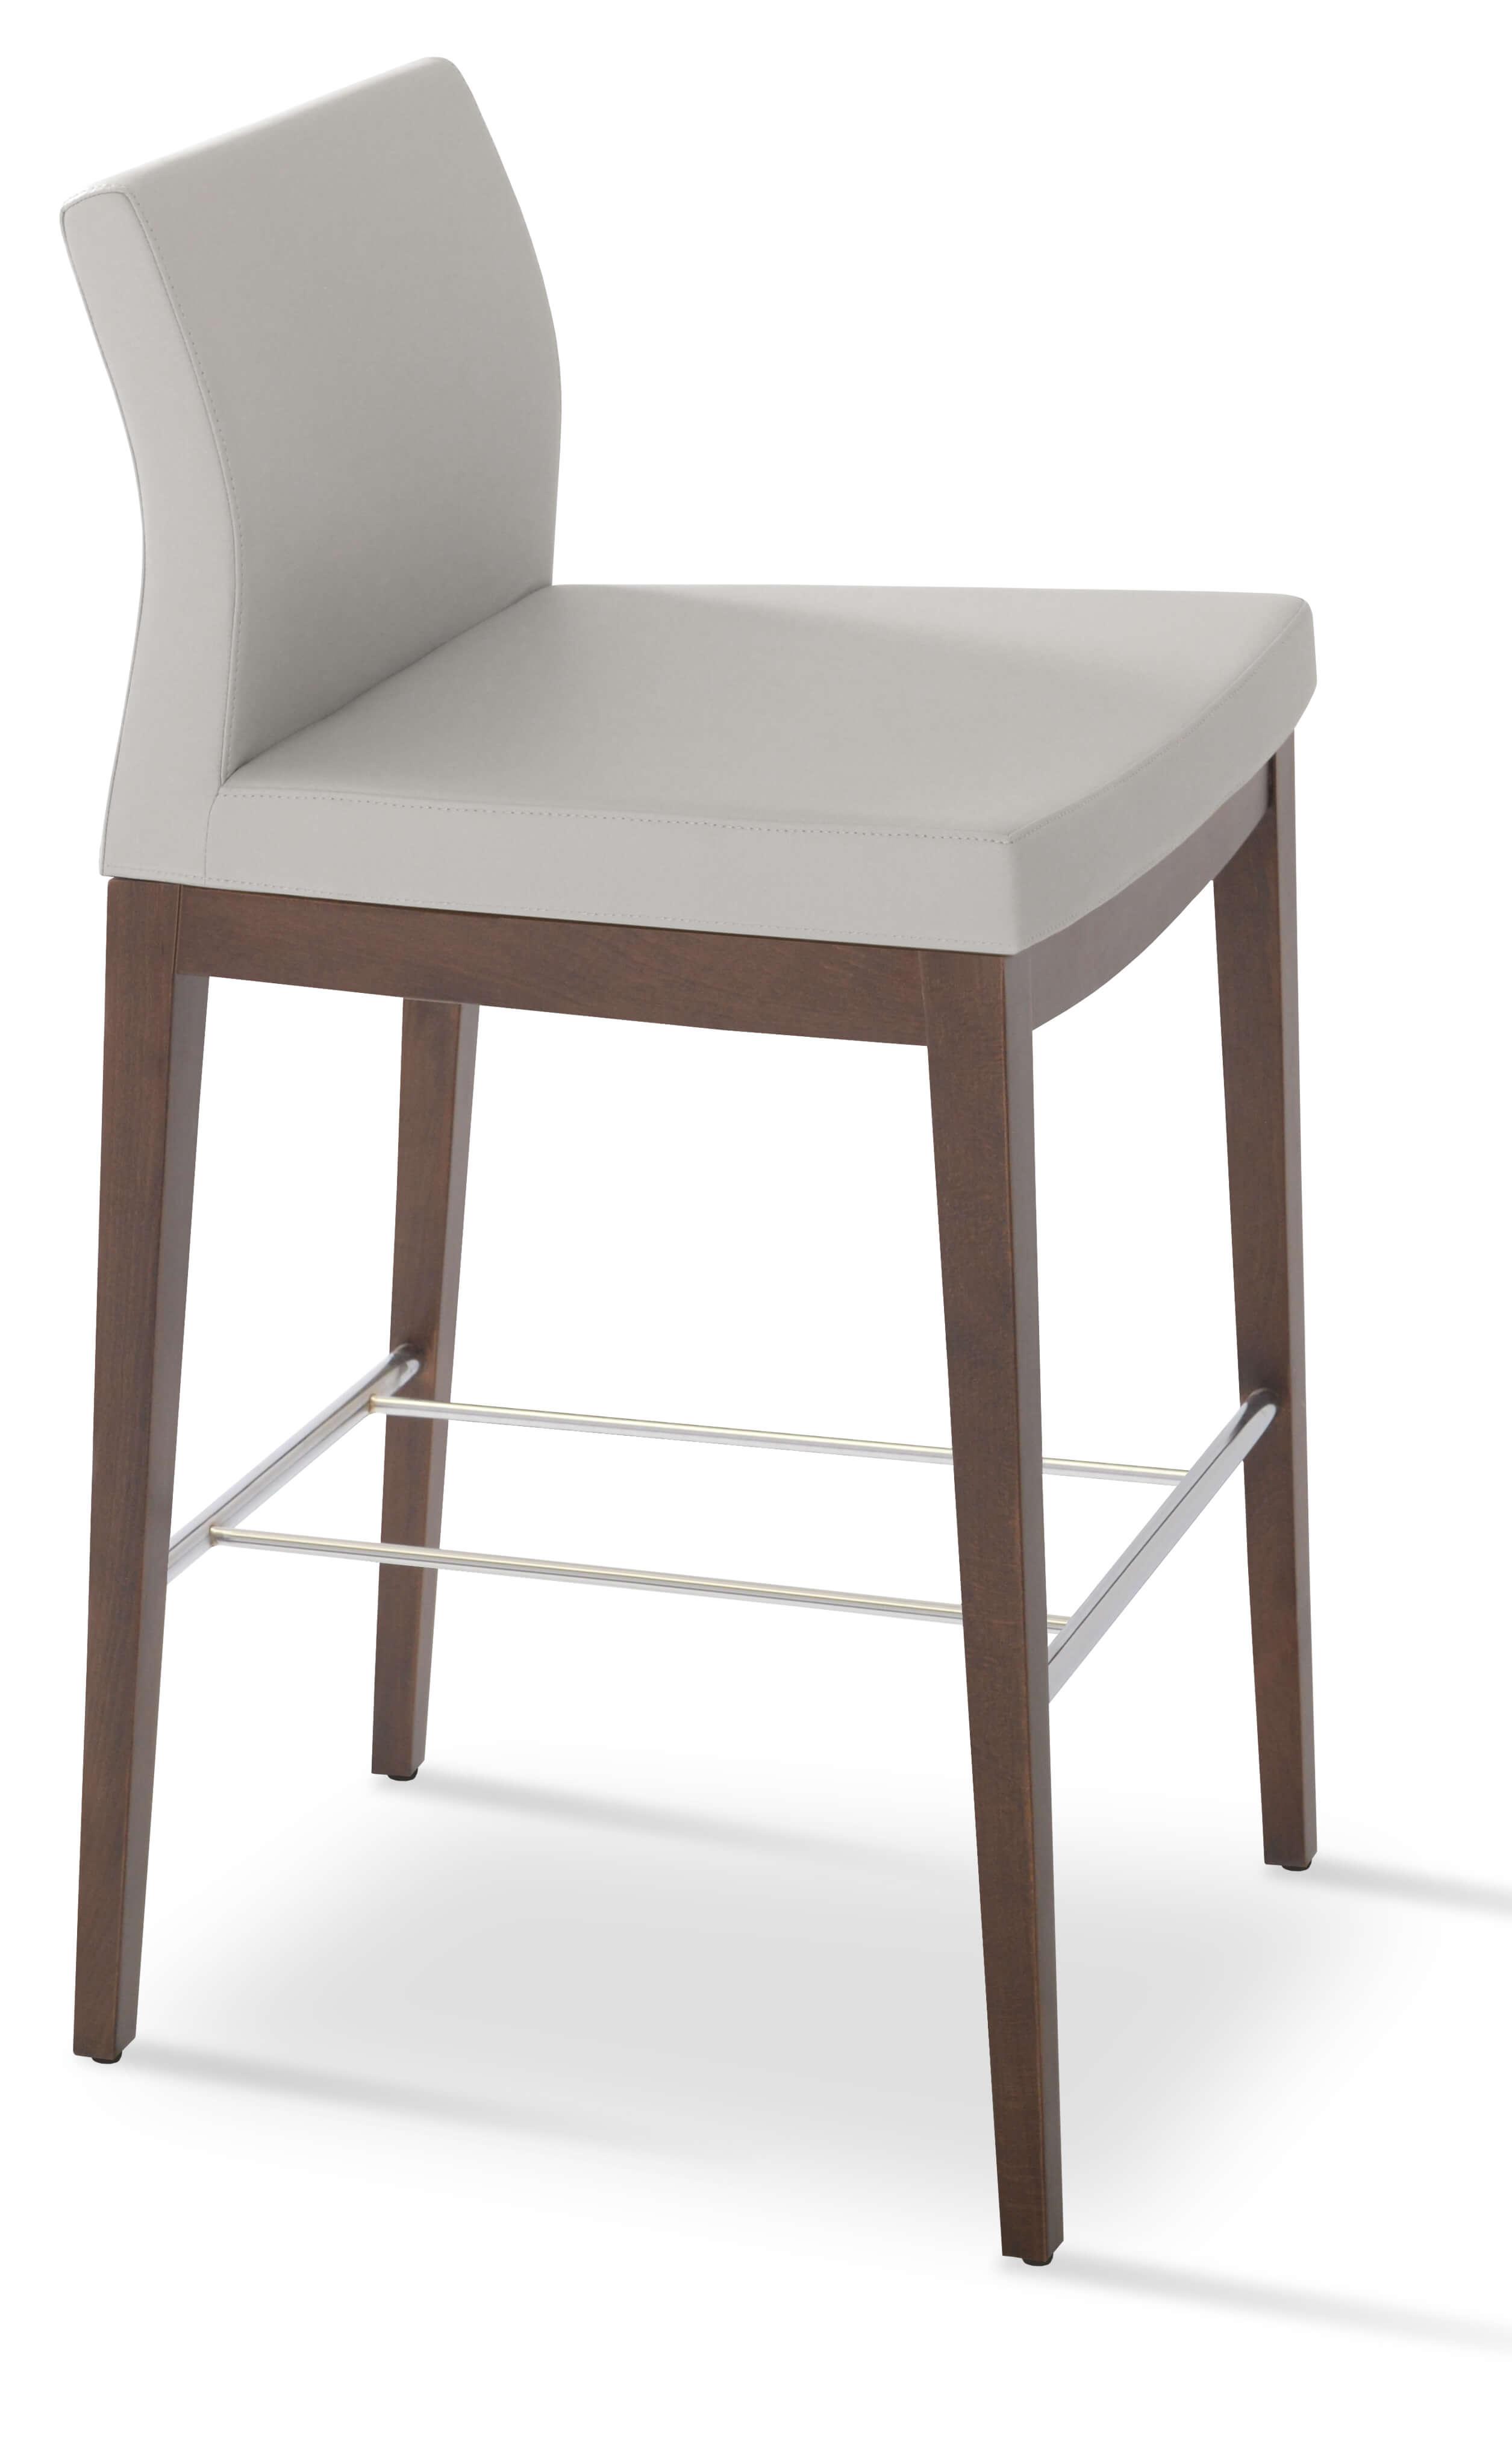 pasha wood bar stool solid beech walnut color white leatherette low back set of 4 by. Black Bedroom Furniture Sets. Home Design Ideas